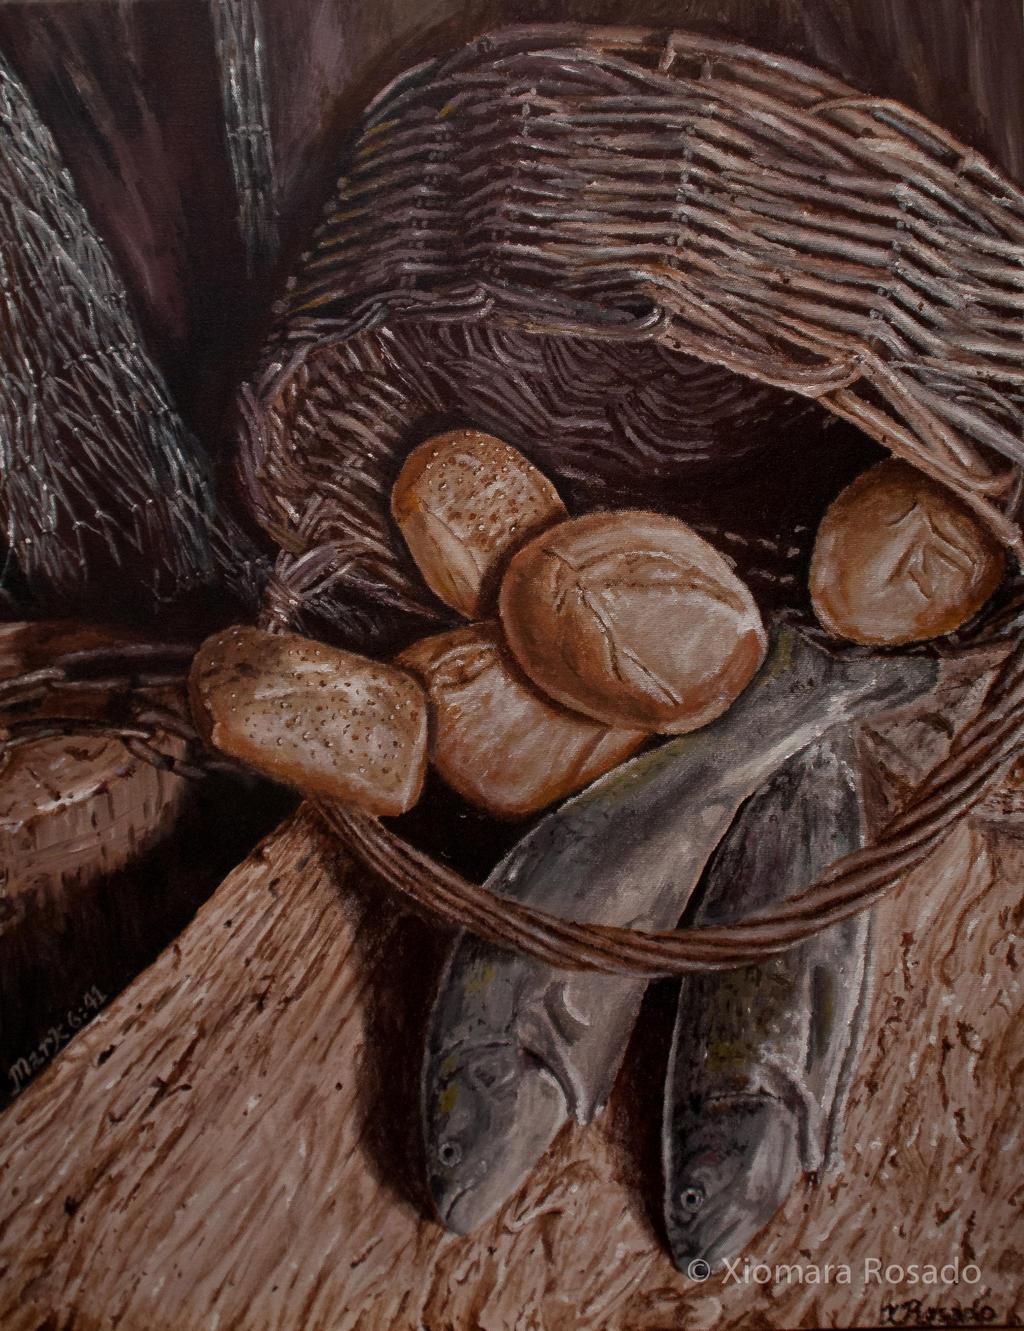 5 Loaves 2 Fish by Xiomara05 on DeviantArt